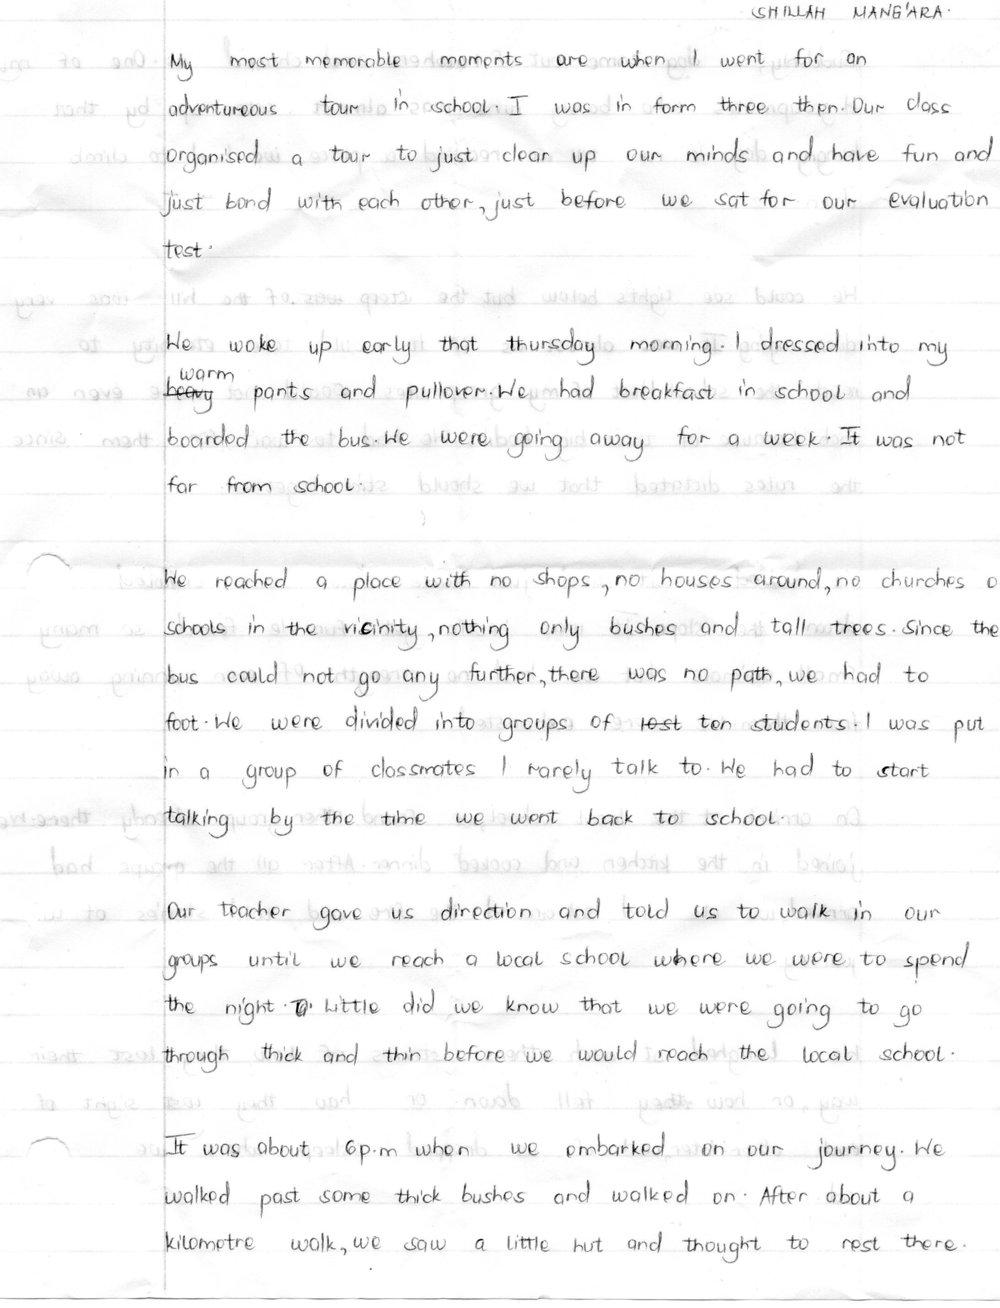 Shillah's Essay 1.jpg